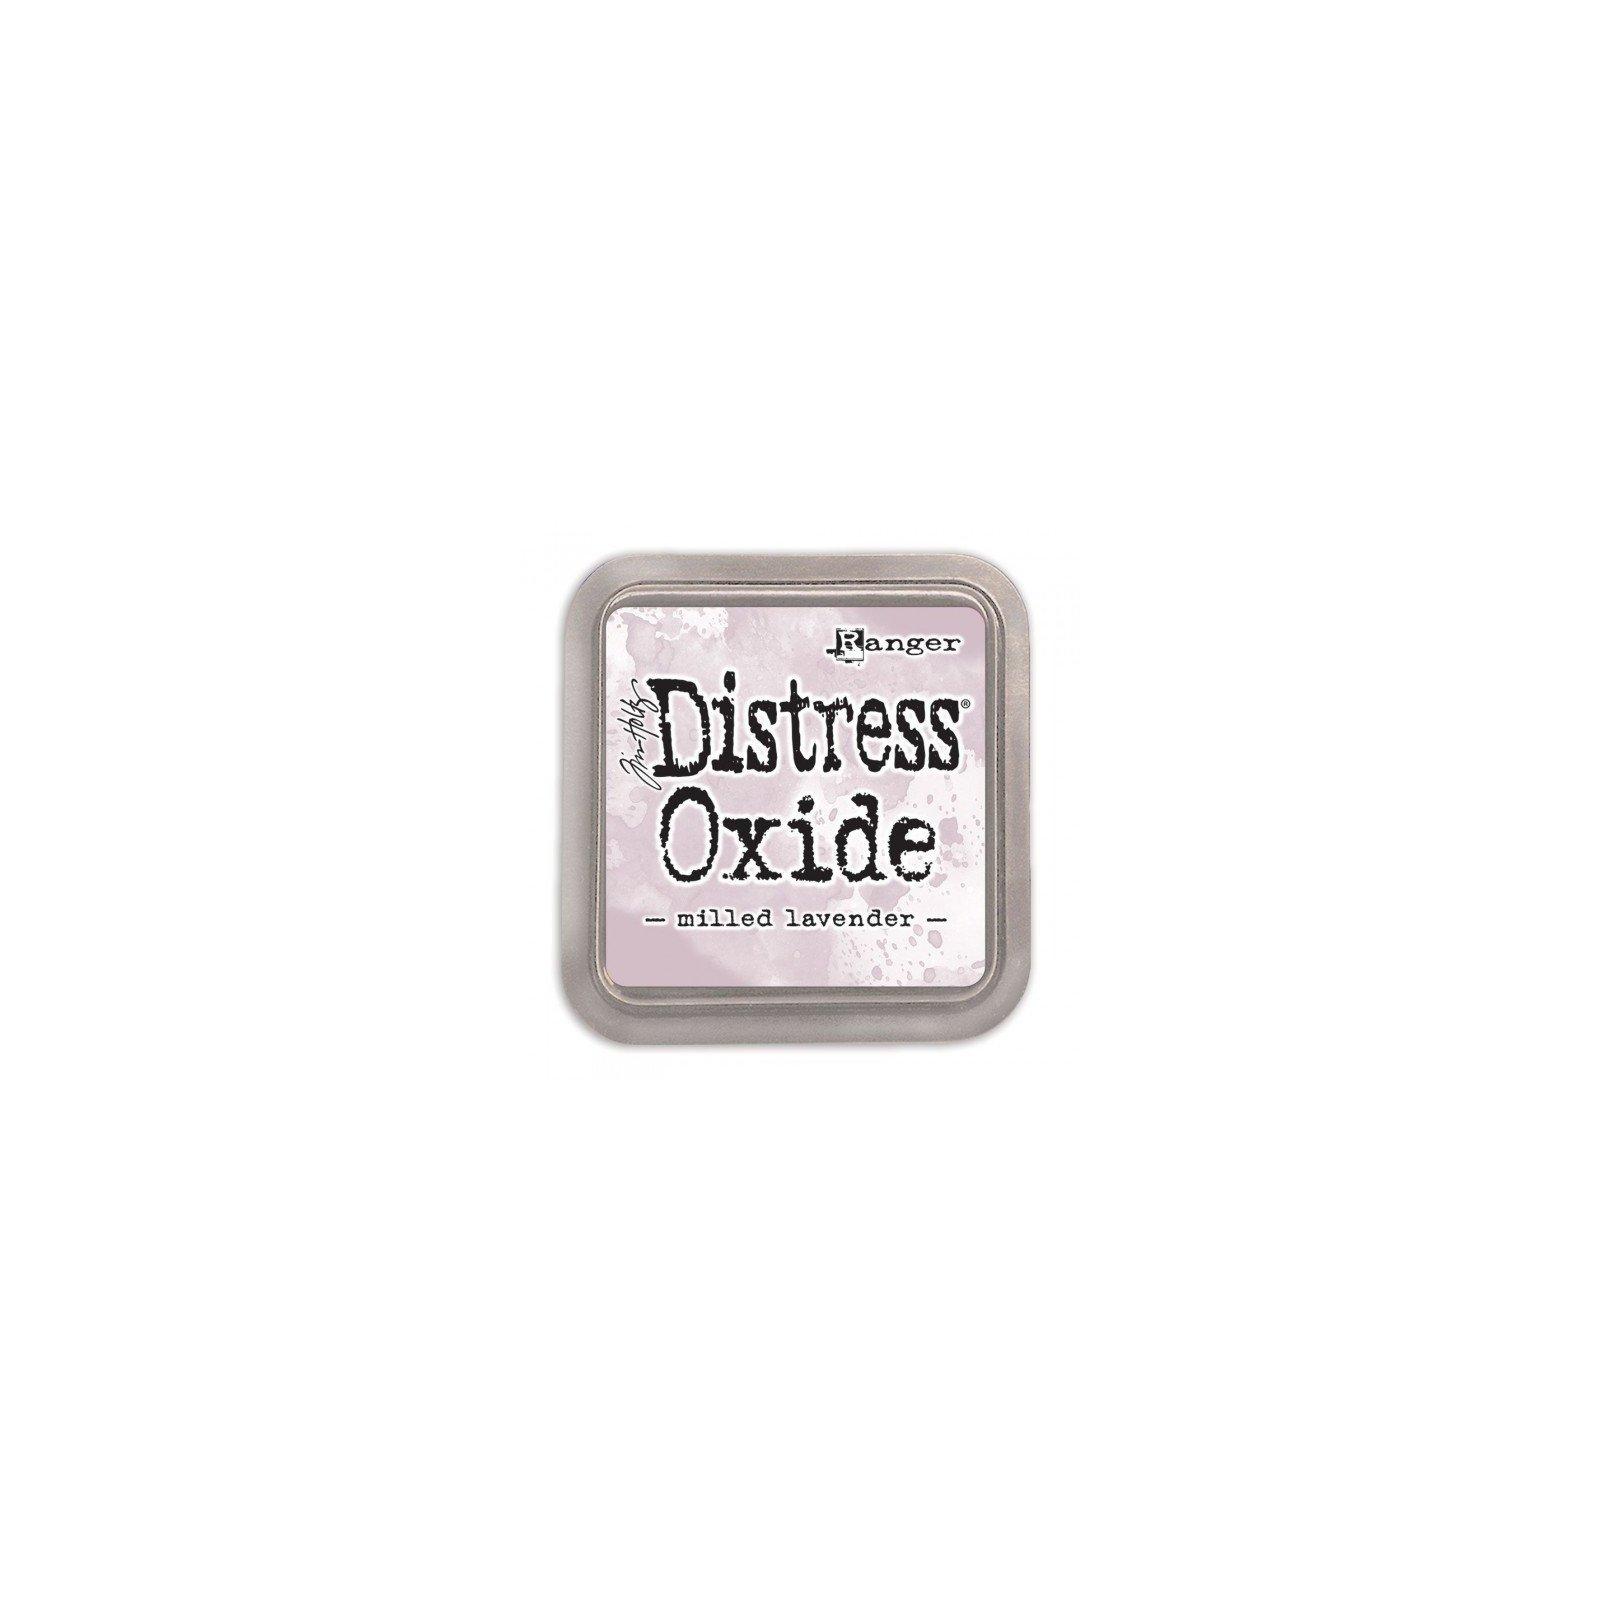 Grand encreur mauve Distress Oxide - Milled Lavender - Ranger